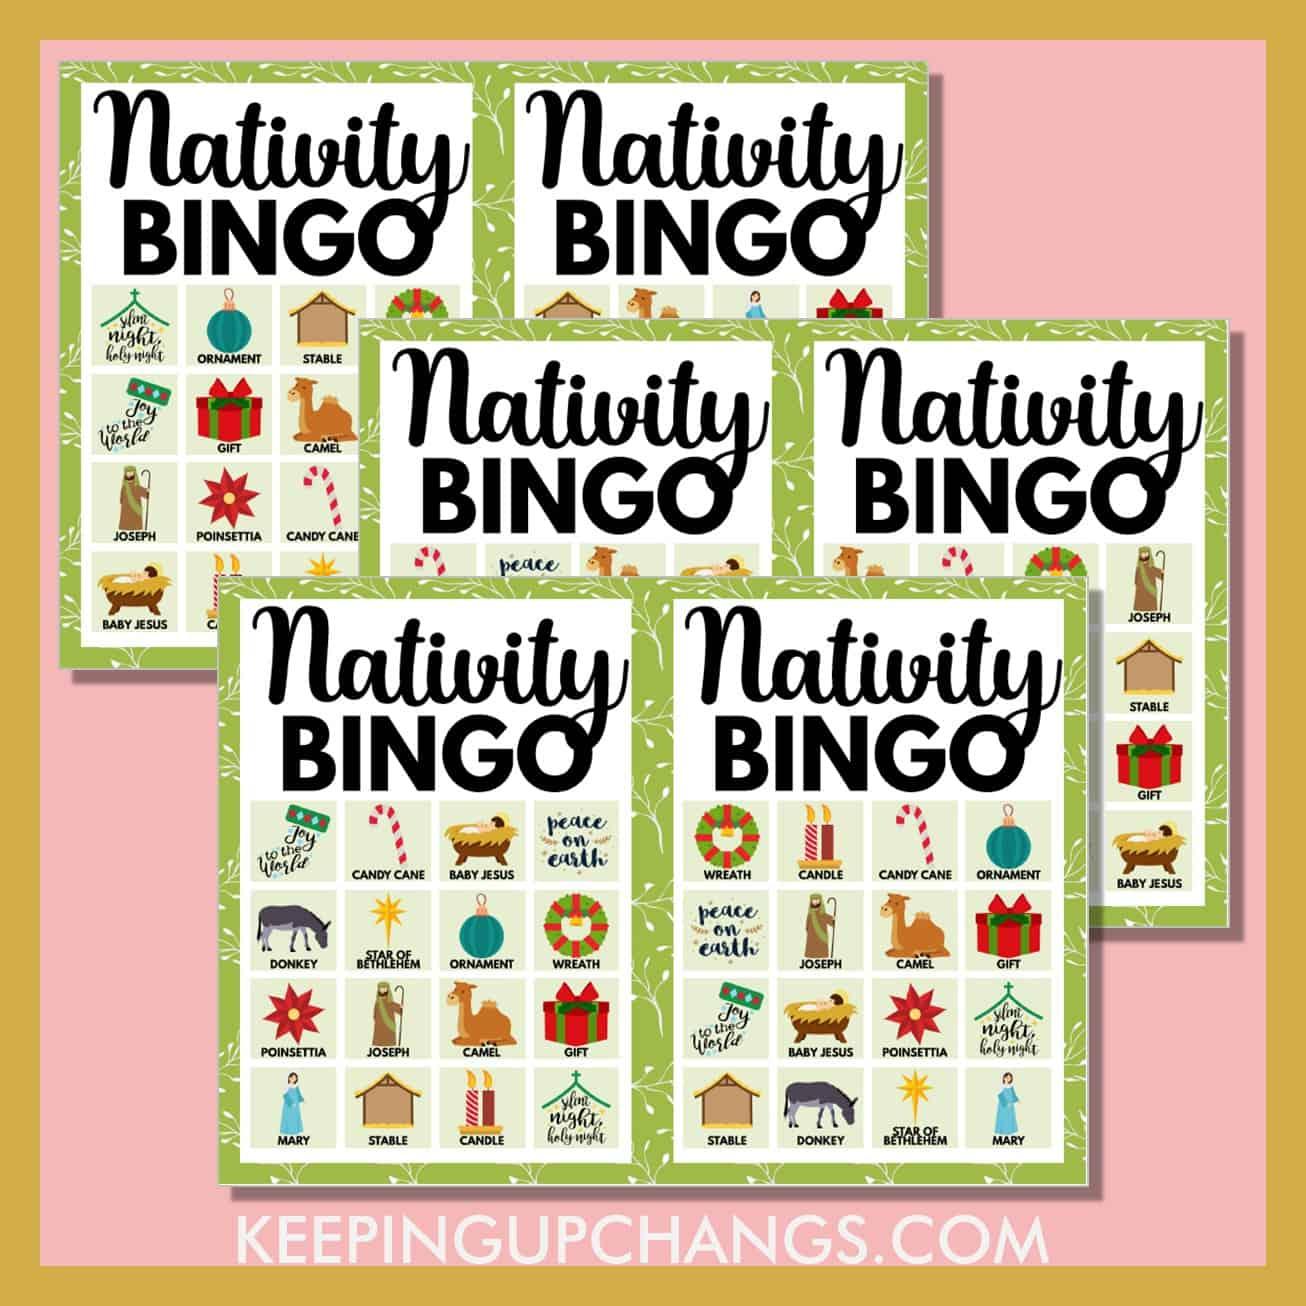 free nativity bible christmas bingo 4x4 game cards.